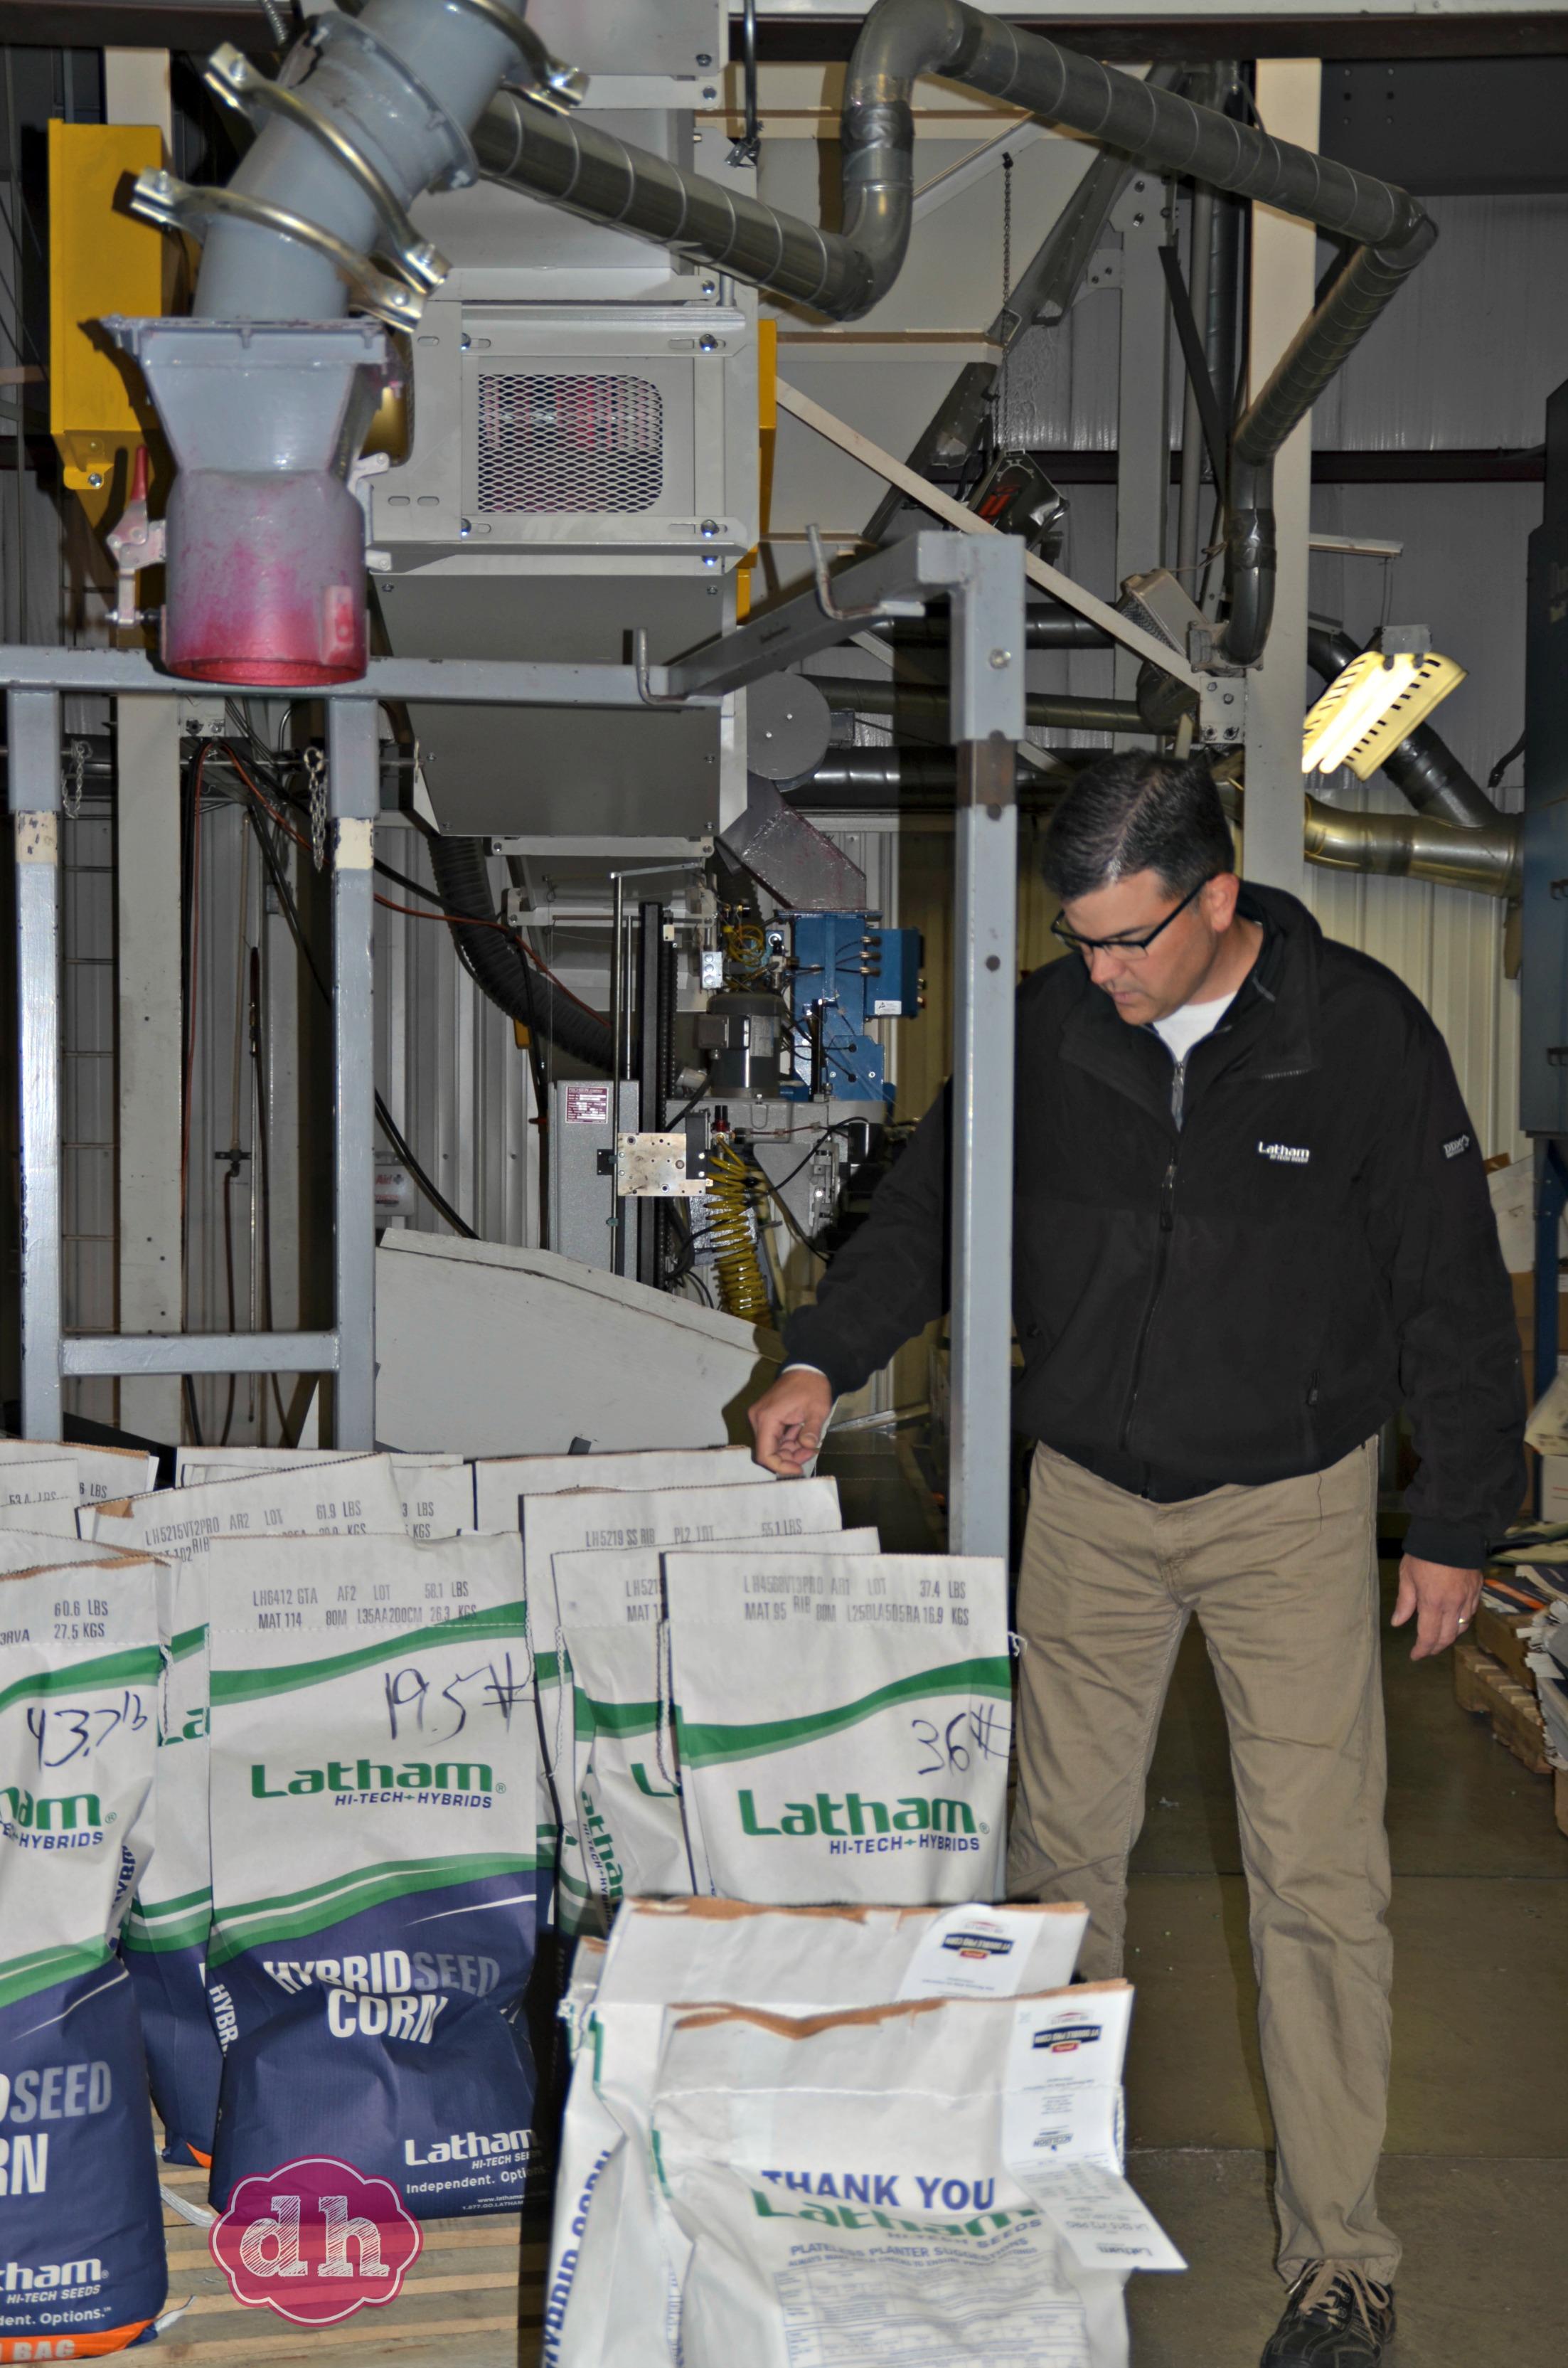 A tour of Latham Hi-Tech Seeds